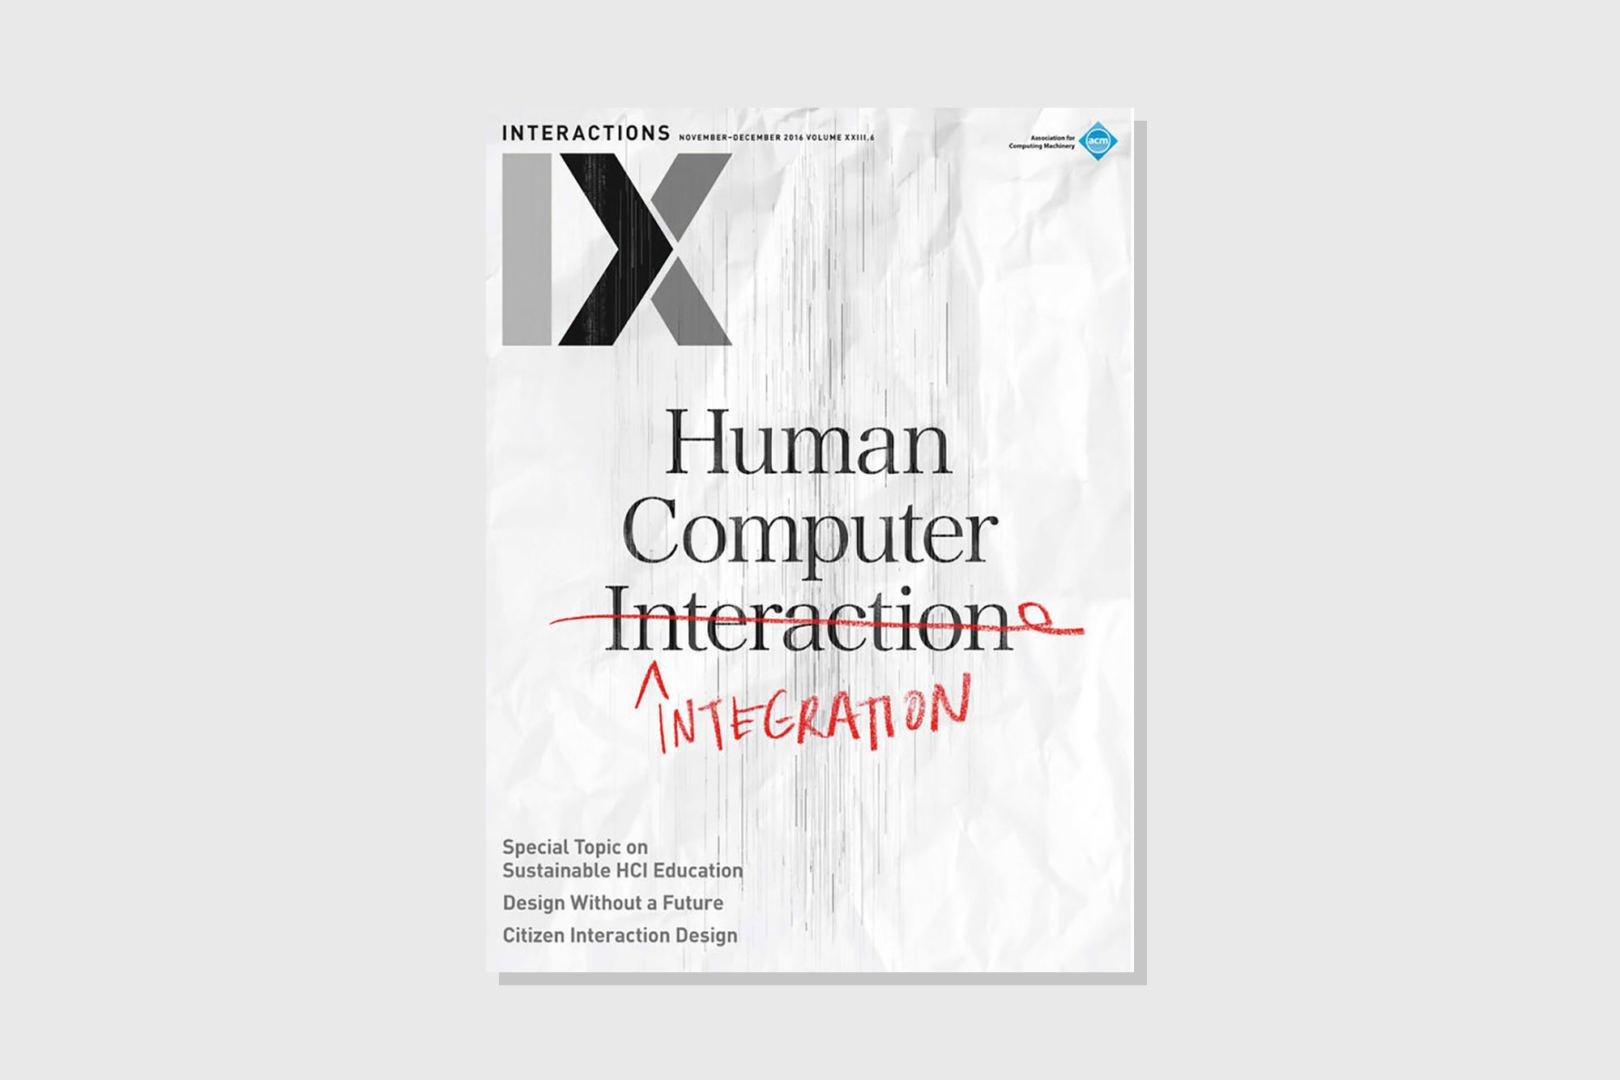 acm interactions magazine